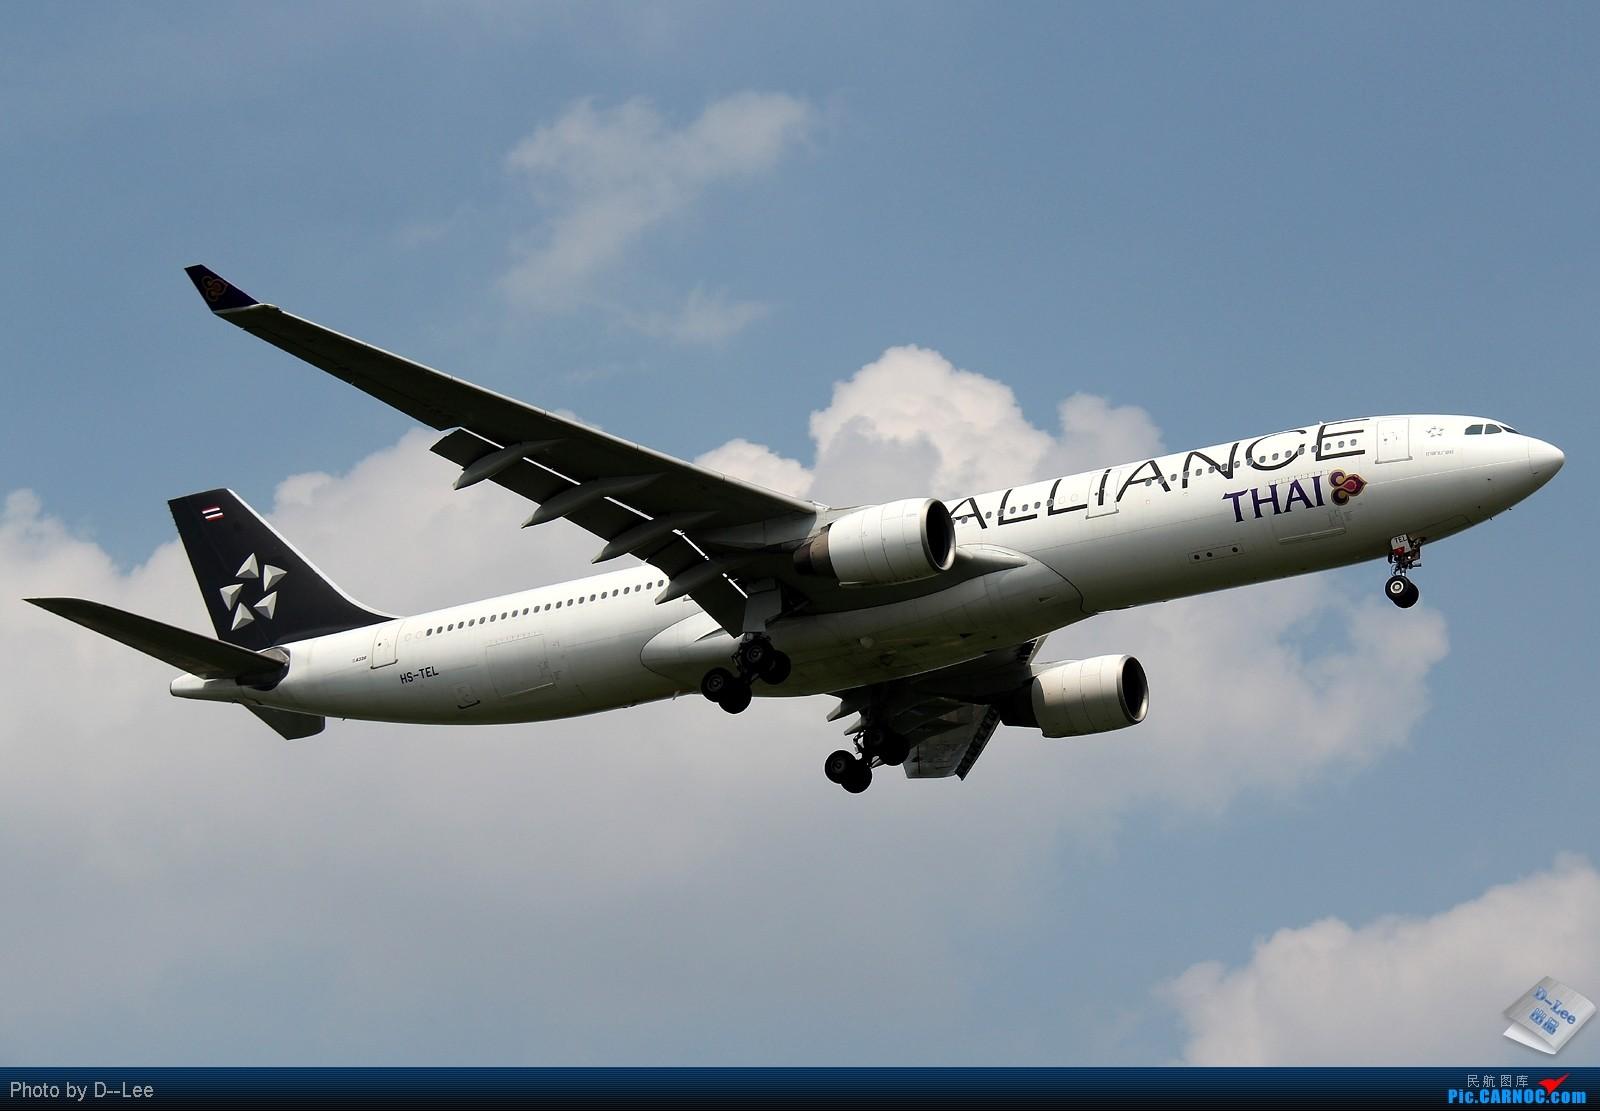 Re:[原创]【广州,你好】-南航SKY TEAM332,港龙333,泰航大星星333外加拍少见少东航AB6全程1600大图放送 AIRBUS A330-300 HS-TEL 中国广州白云机场